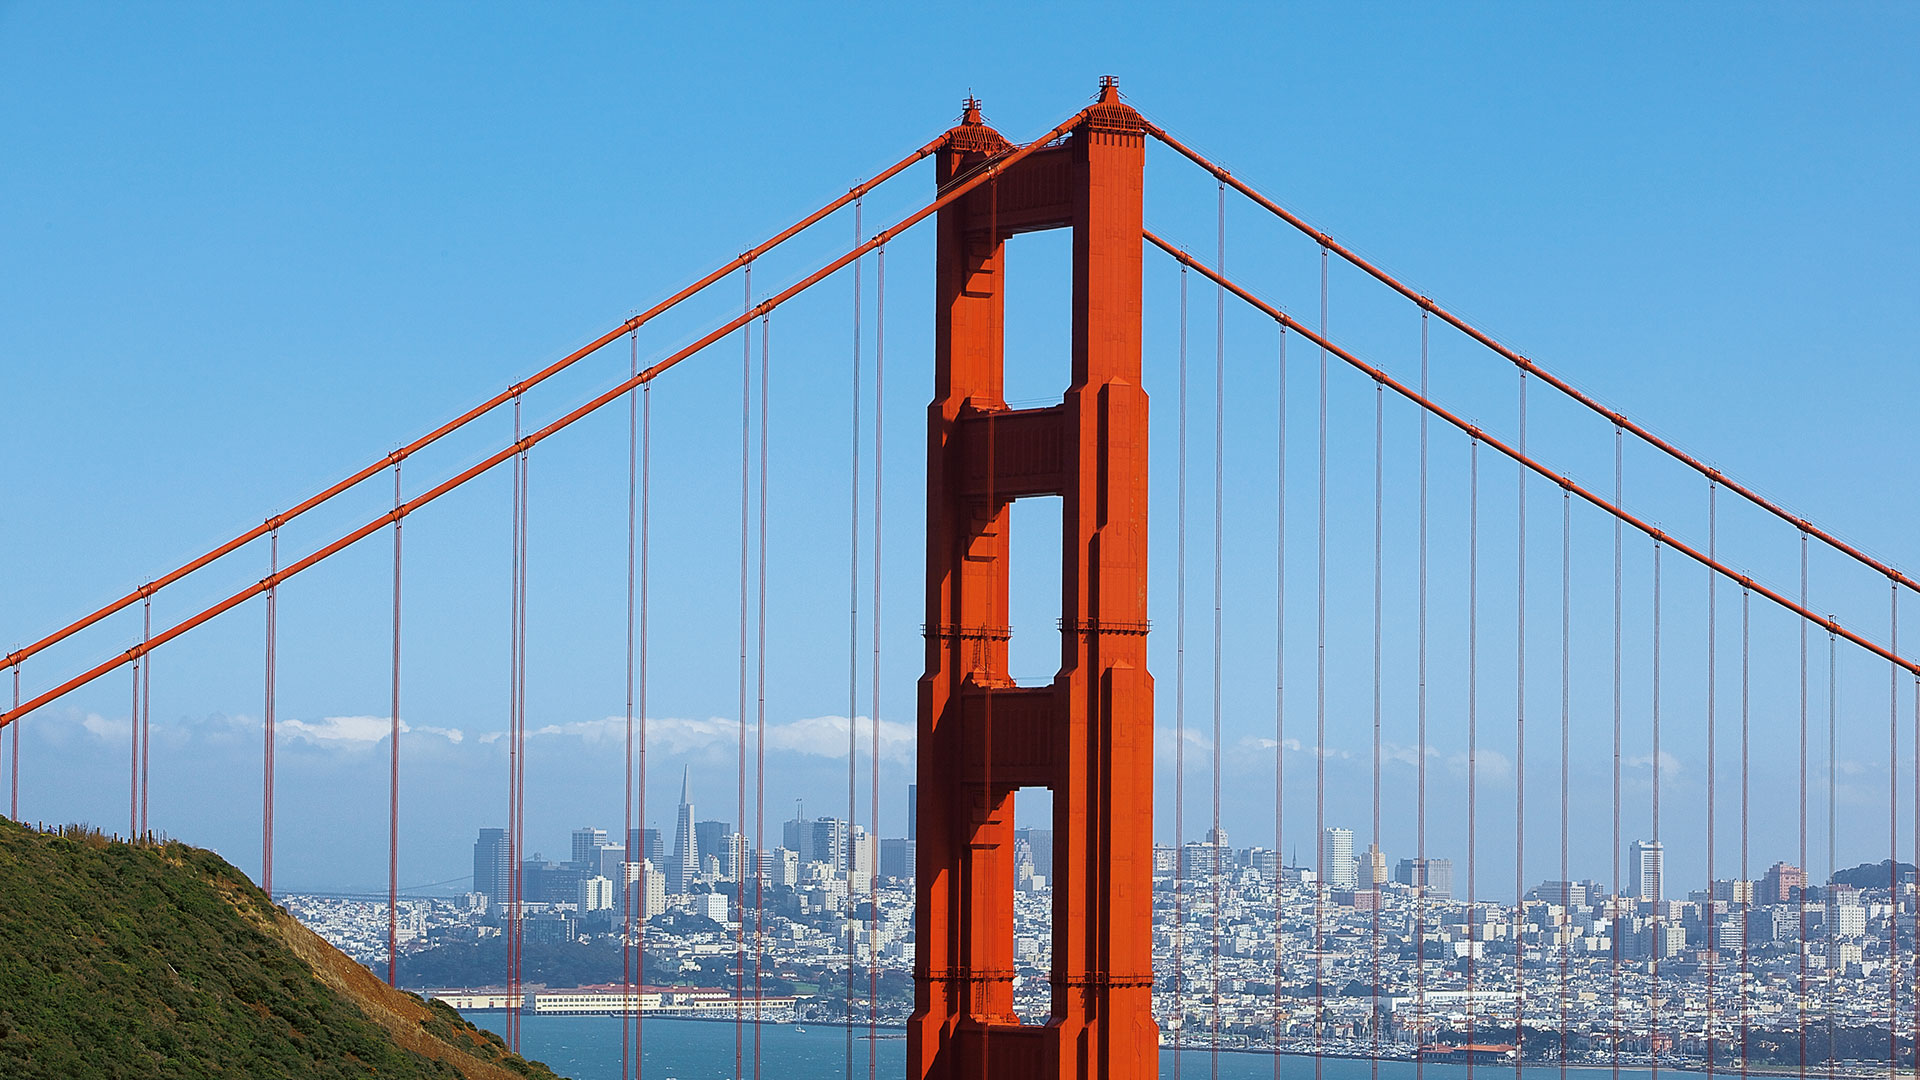 Image of Golden Gate Bridge Image